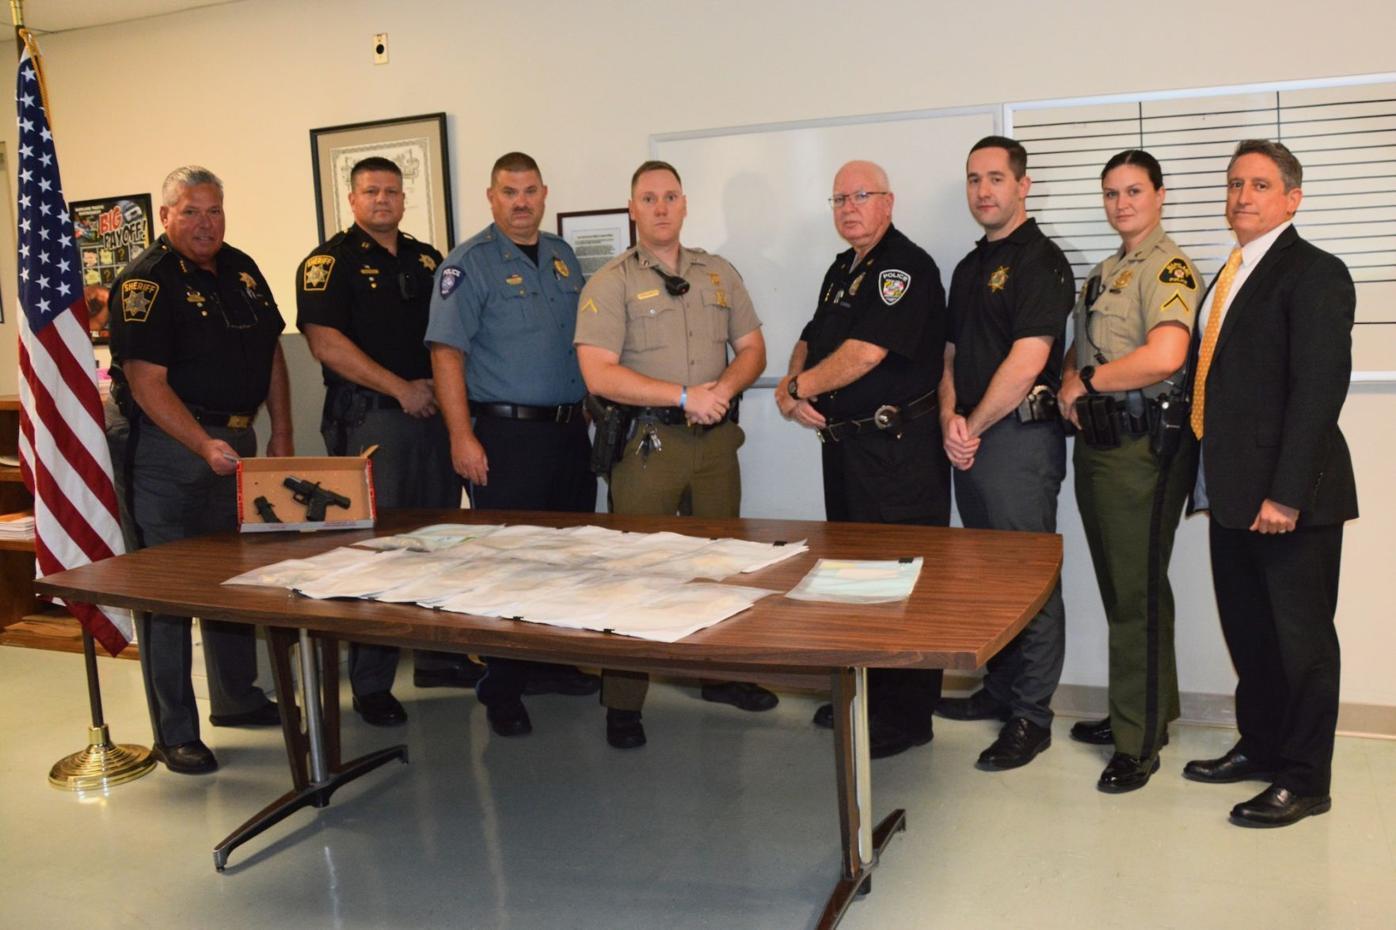 Record amount of fentanyl seized; suspected 'higher level dealer' arrested